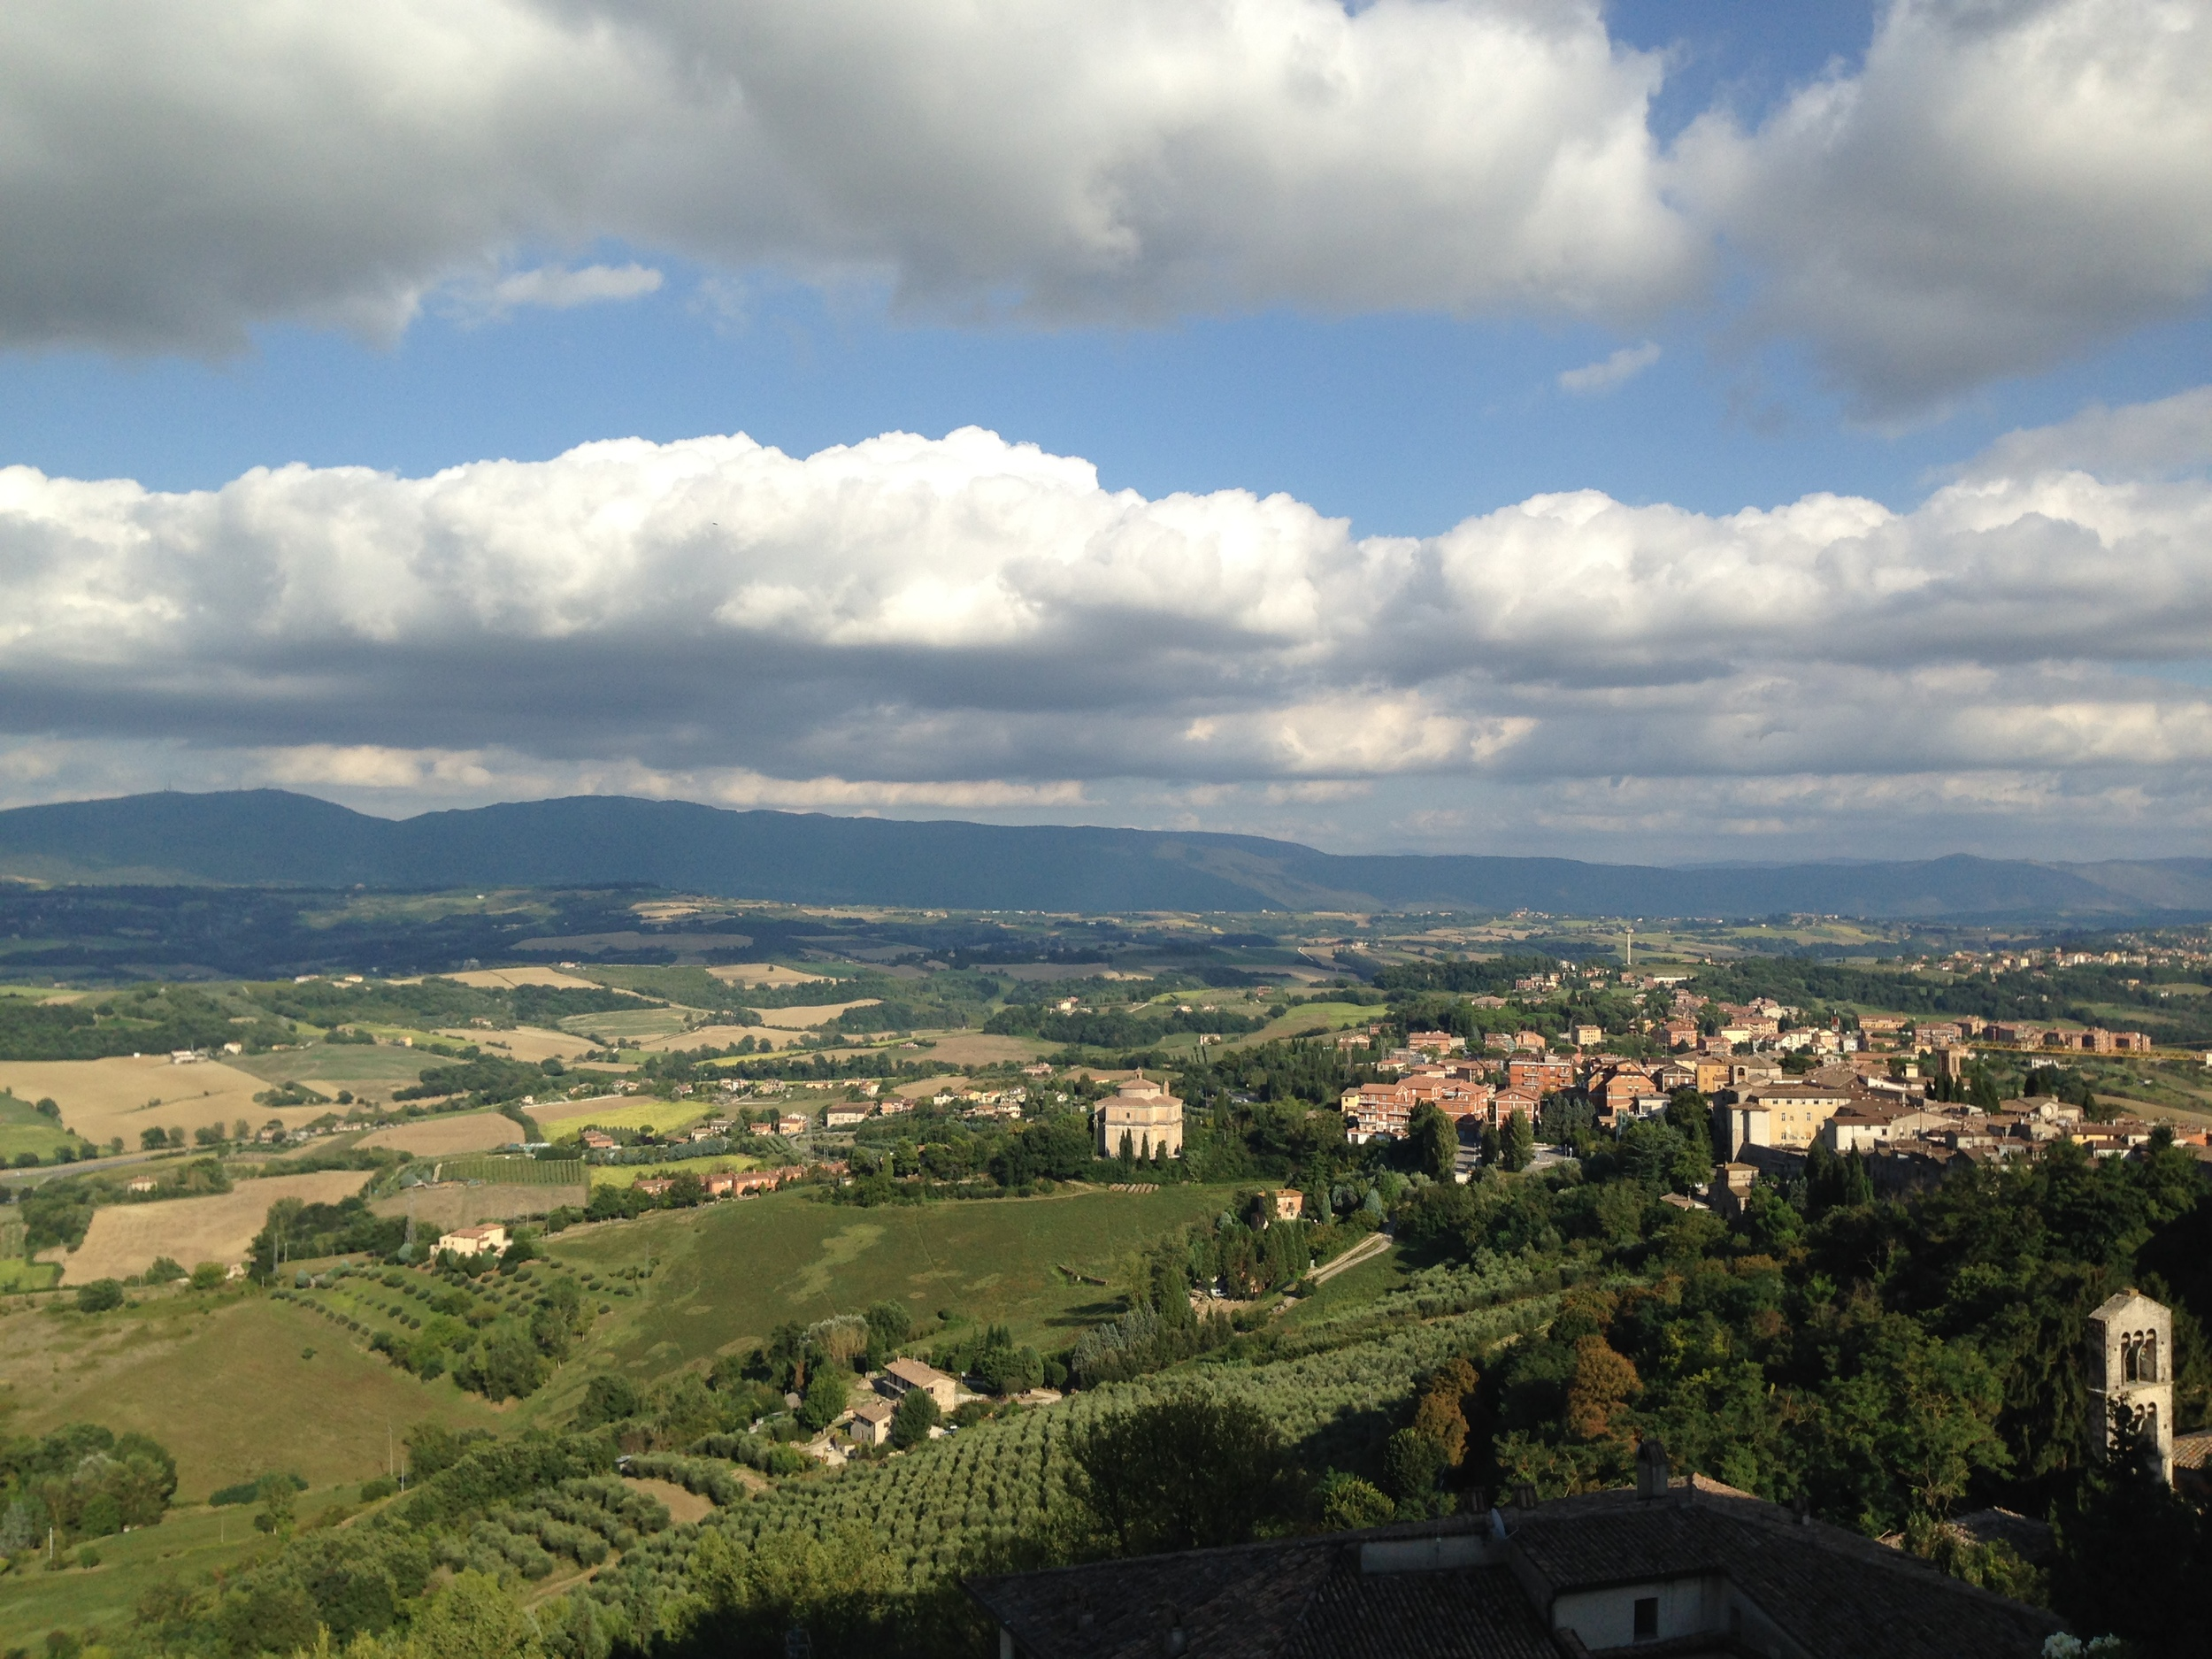 The fertile landscape of Umbria.